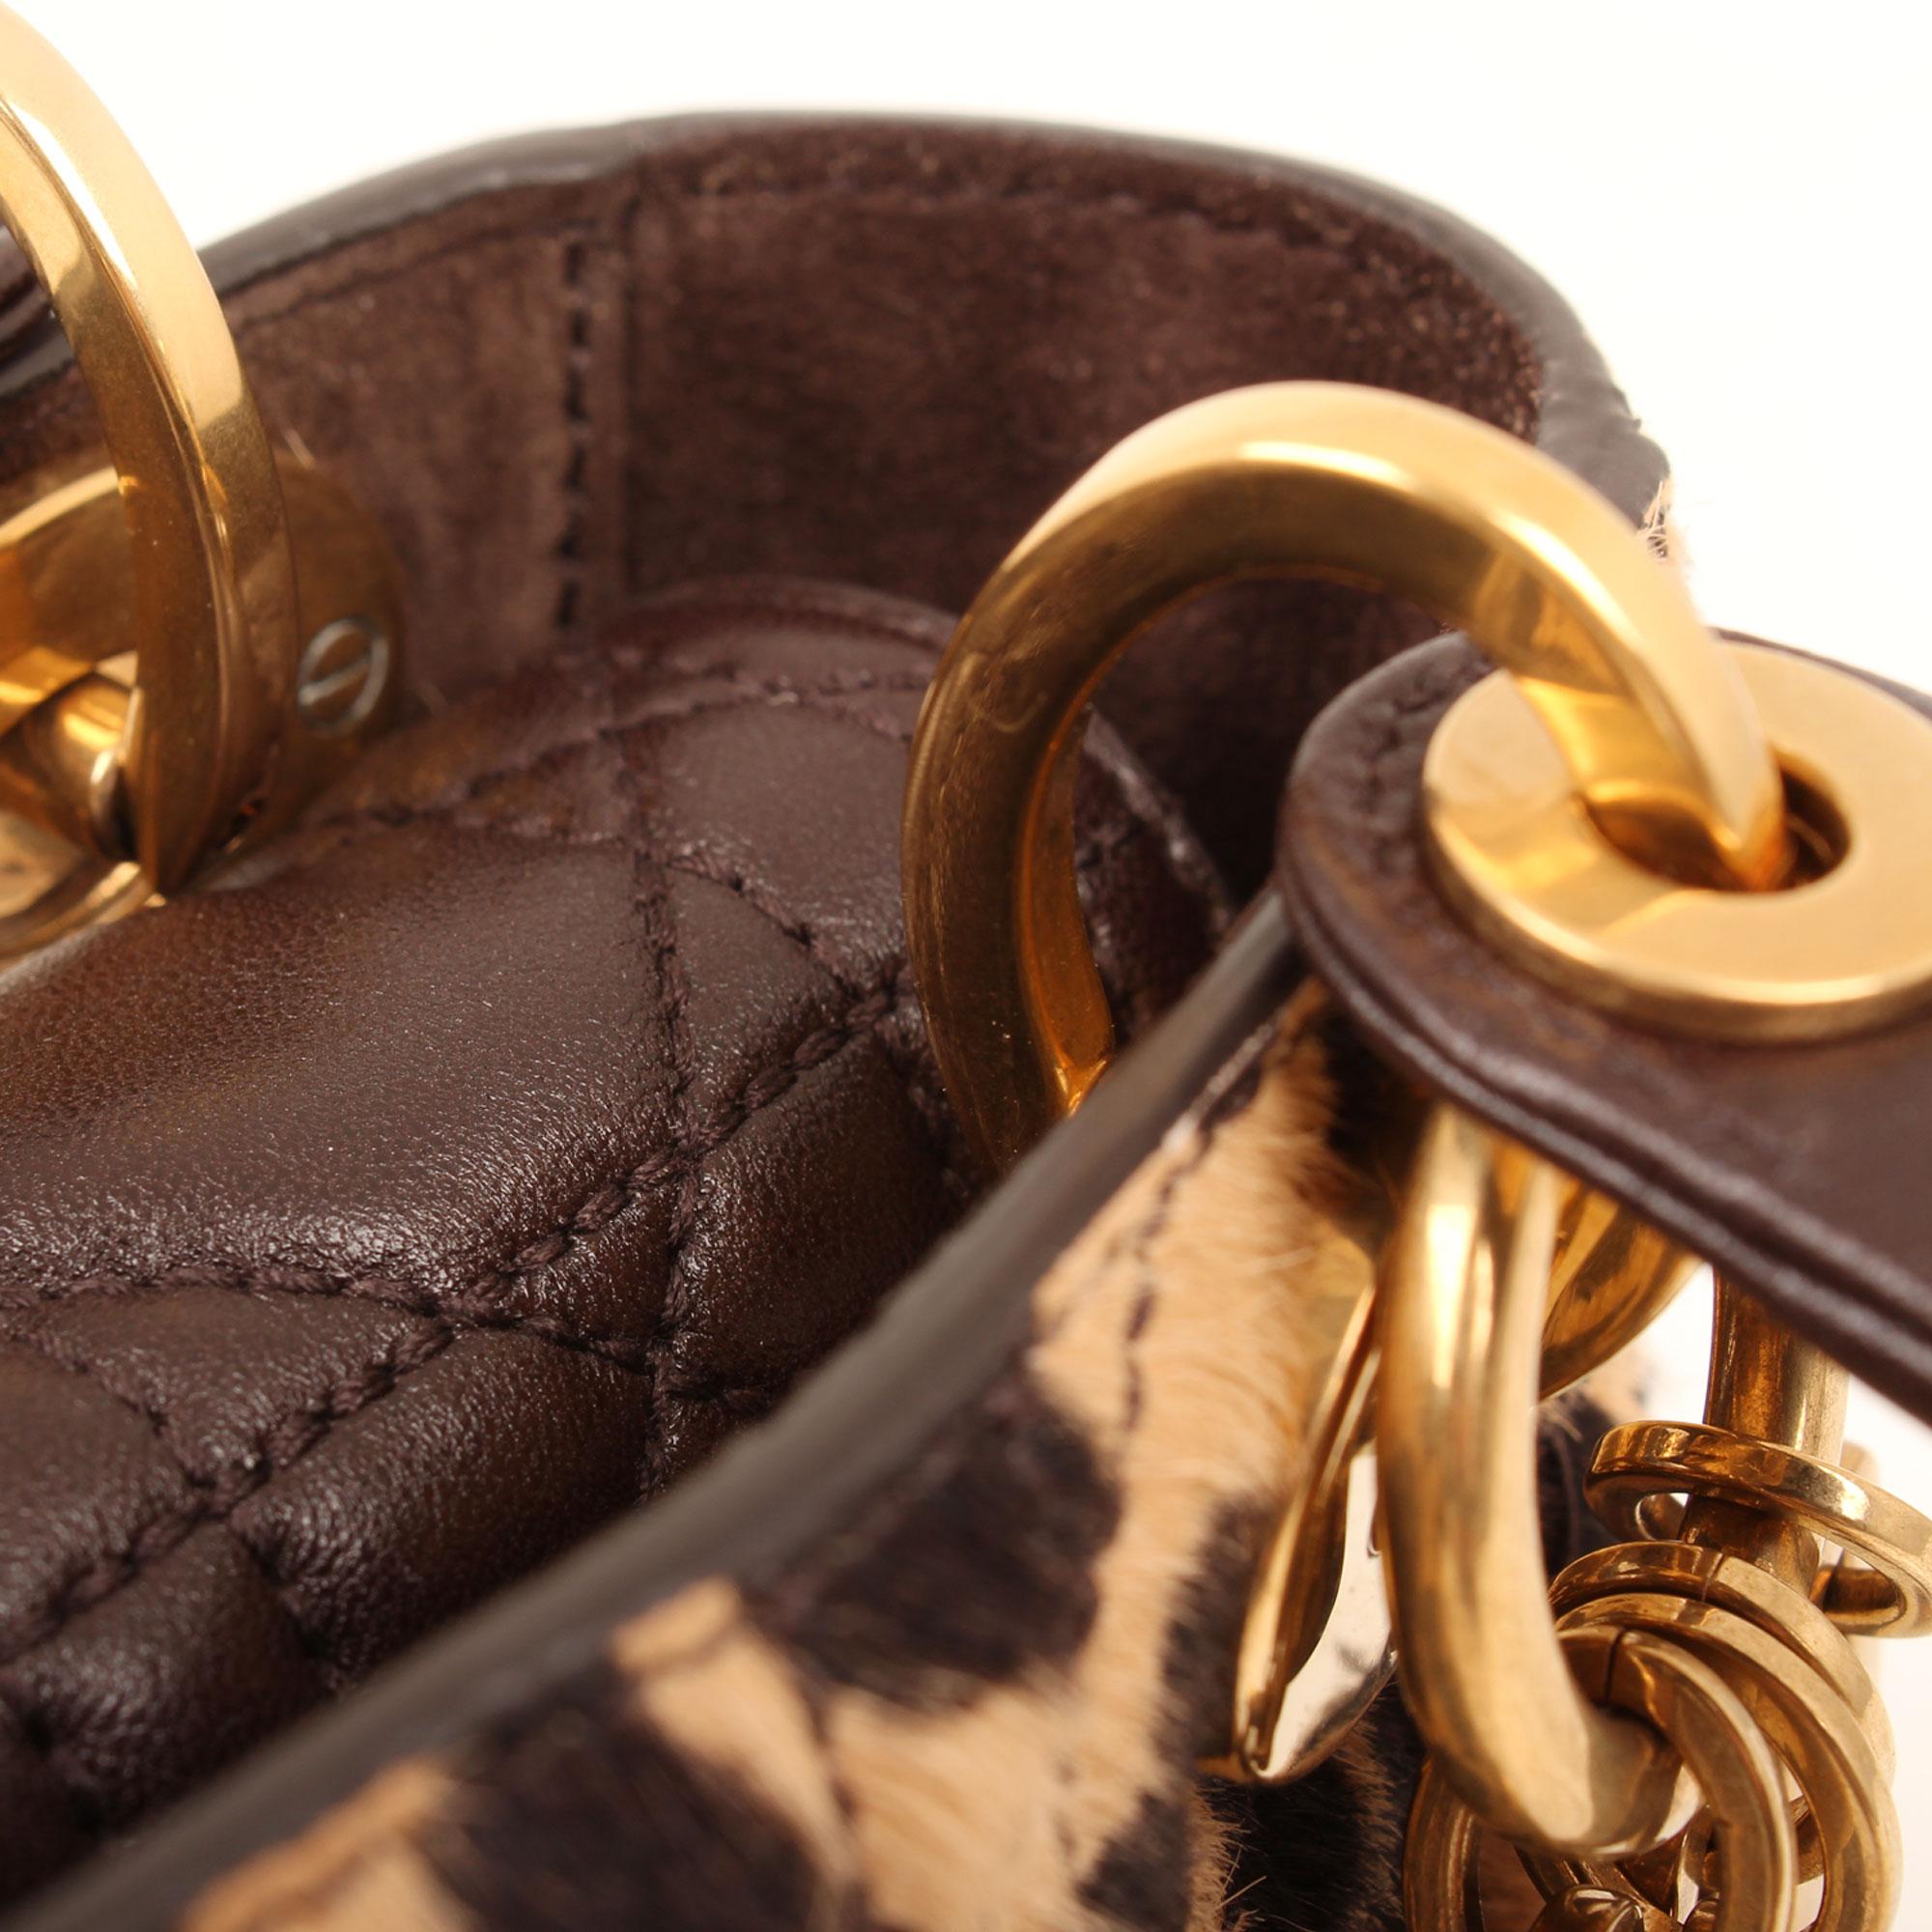 Imagen de los detalles del bolso dior lady dior mini animal print pony calfskin